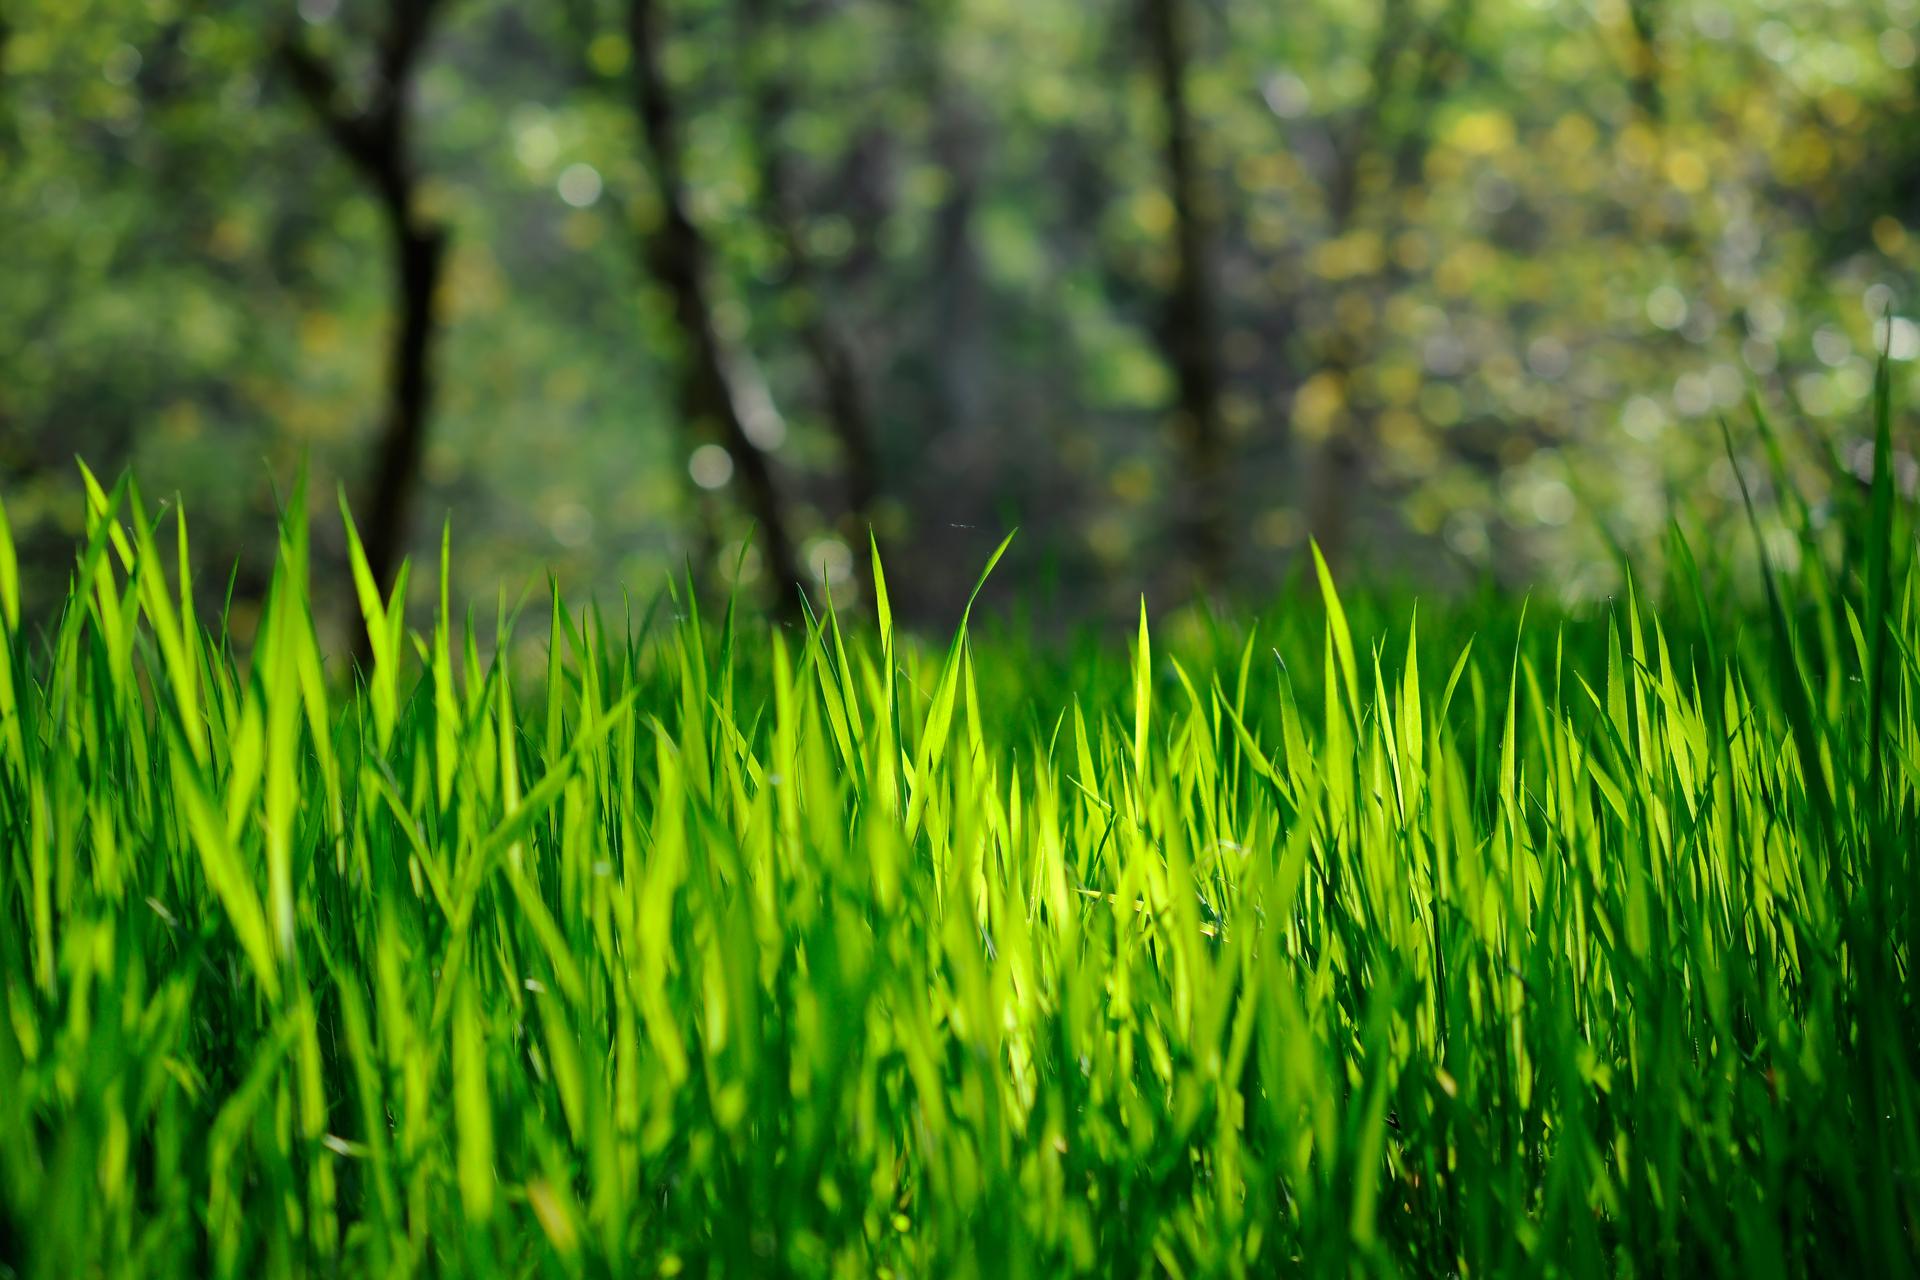 grass wallpaper hd - HD Desktop Wallpapers | 4k HD